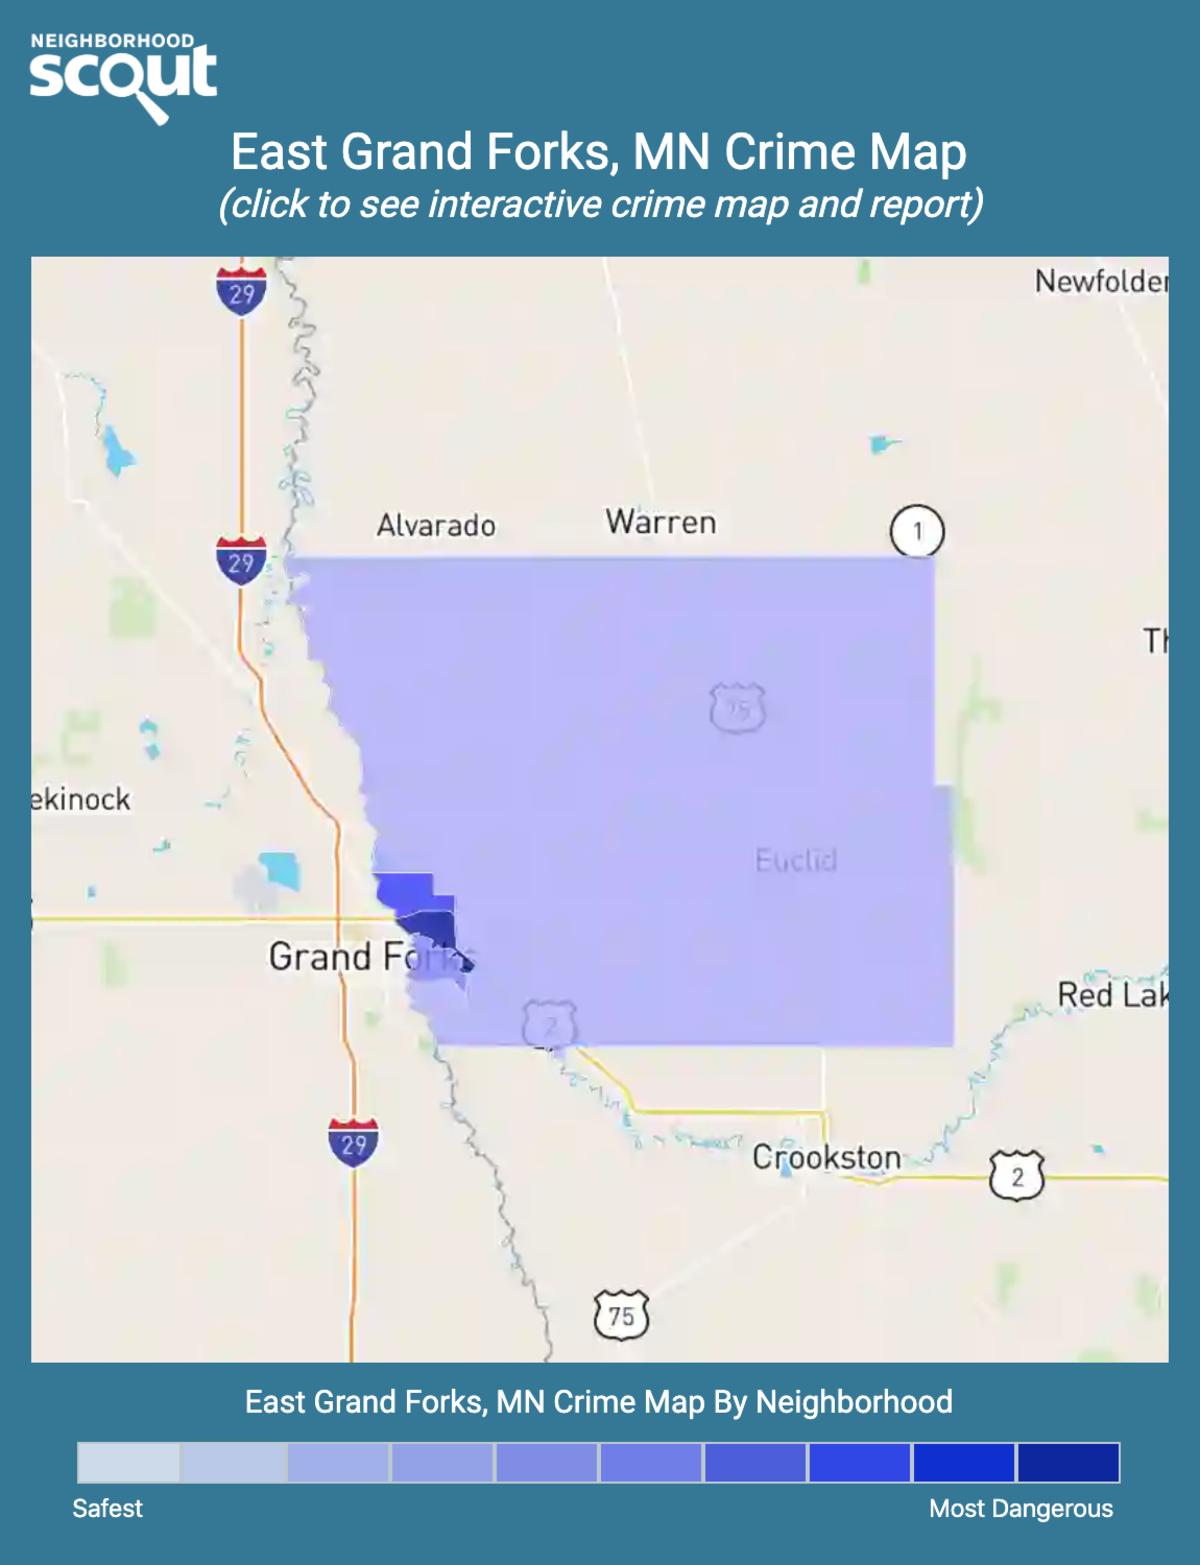 East Grand Forks, Minnesota crime map